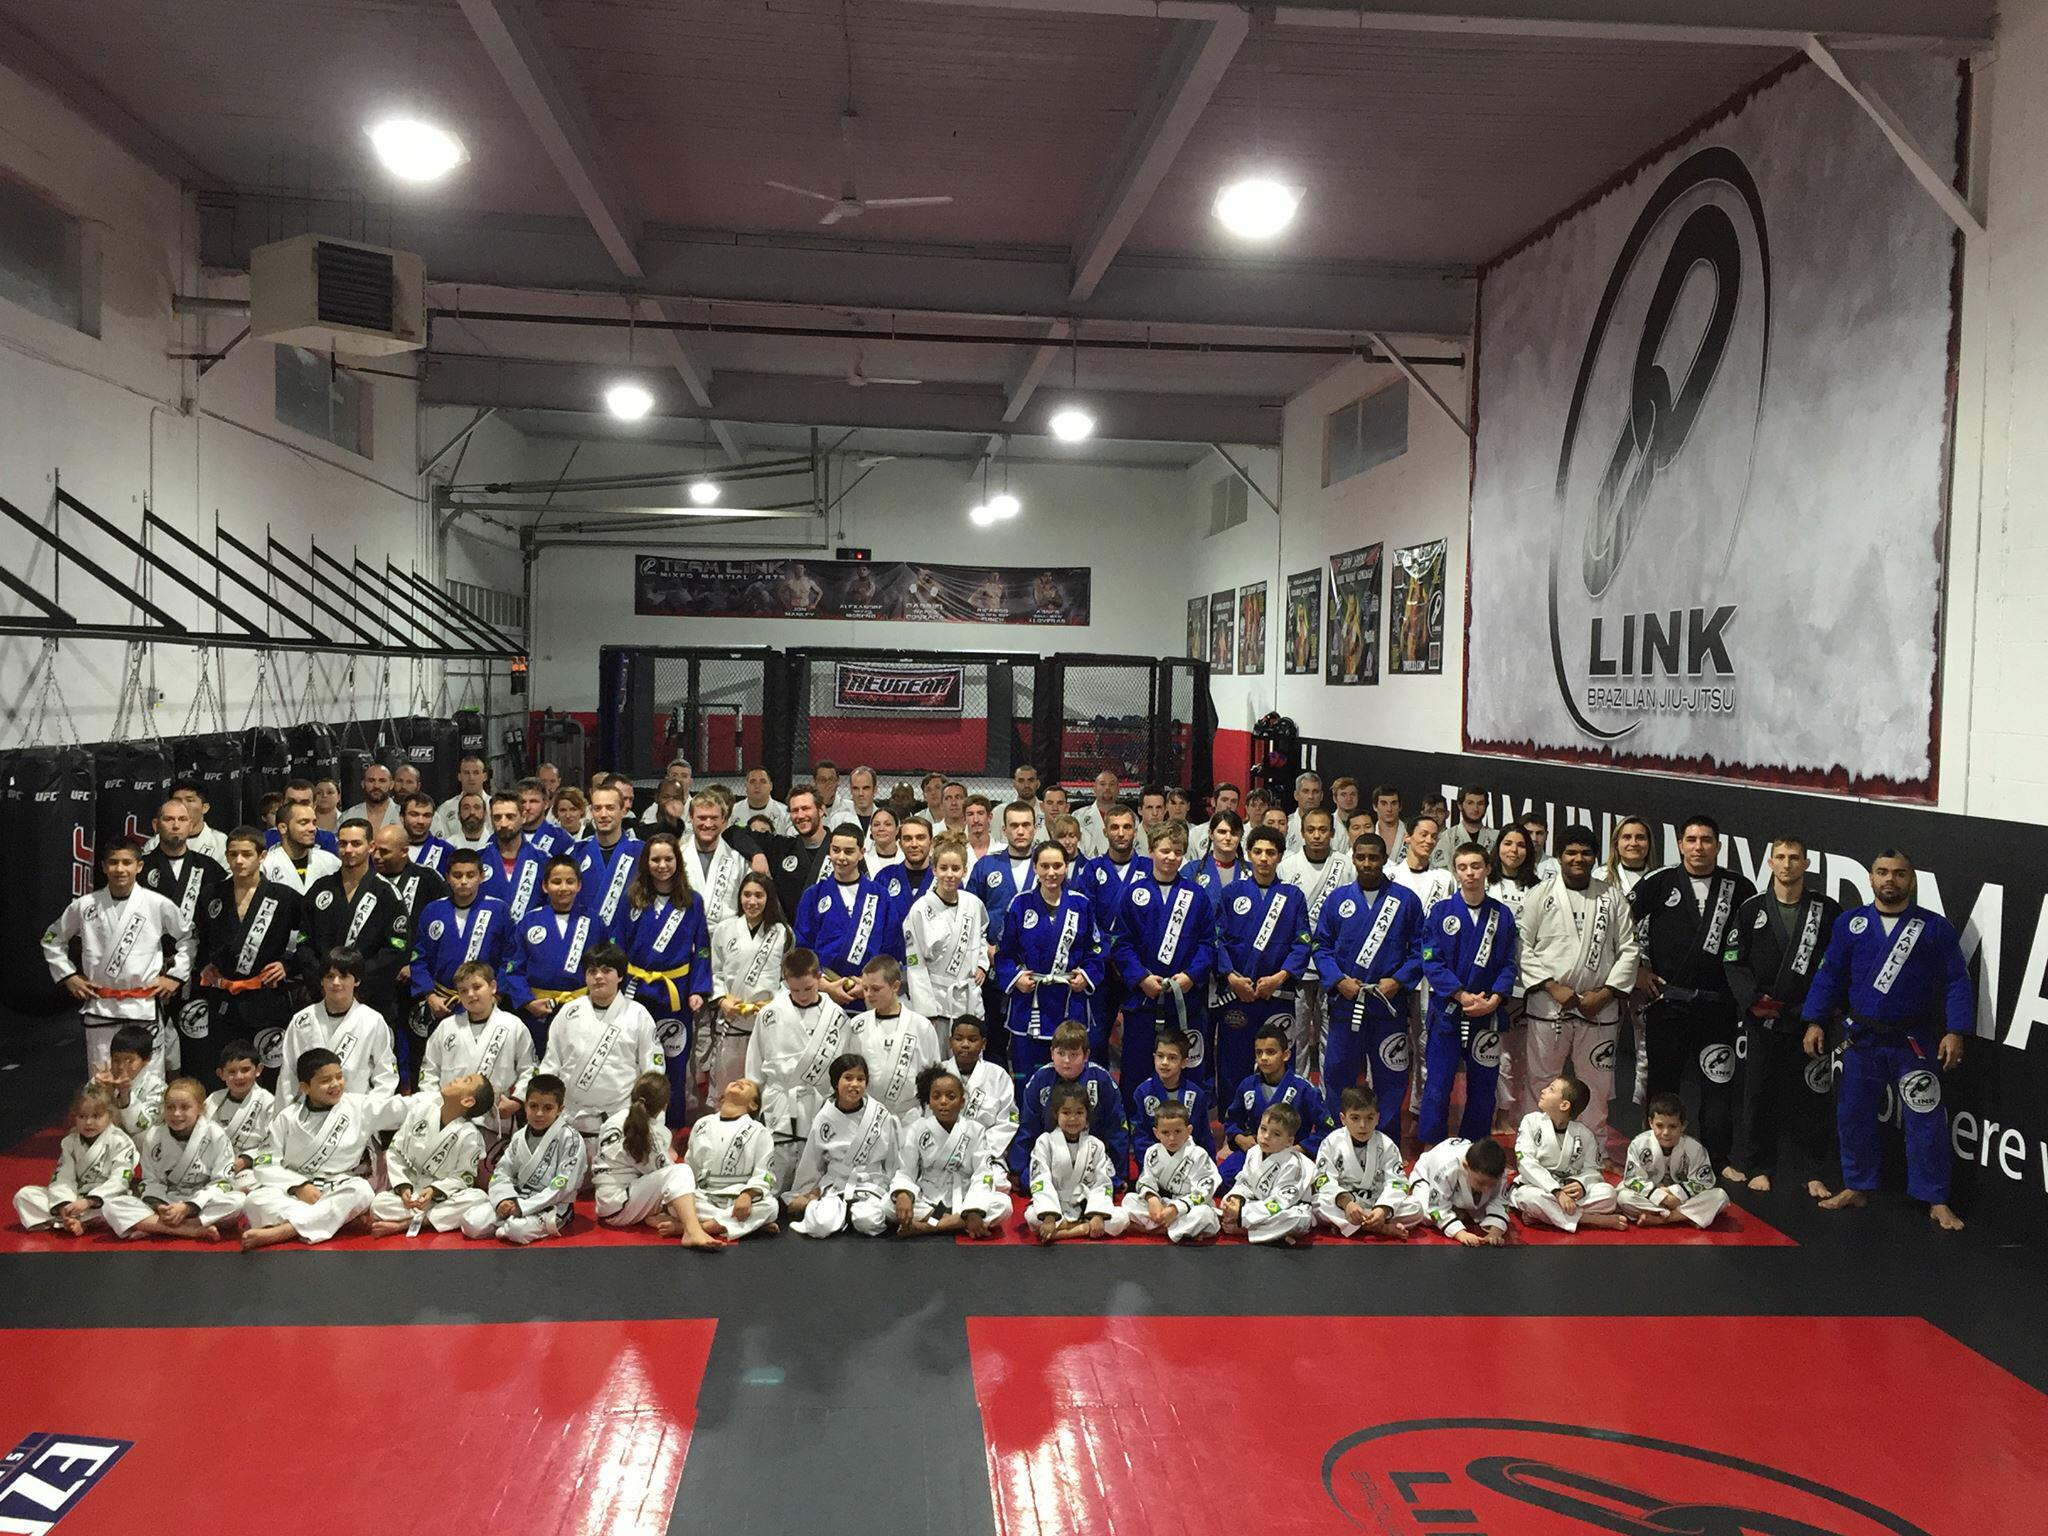 Team Link BJJ Gym Western Mass